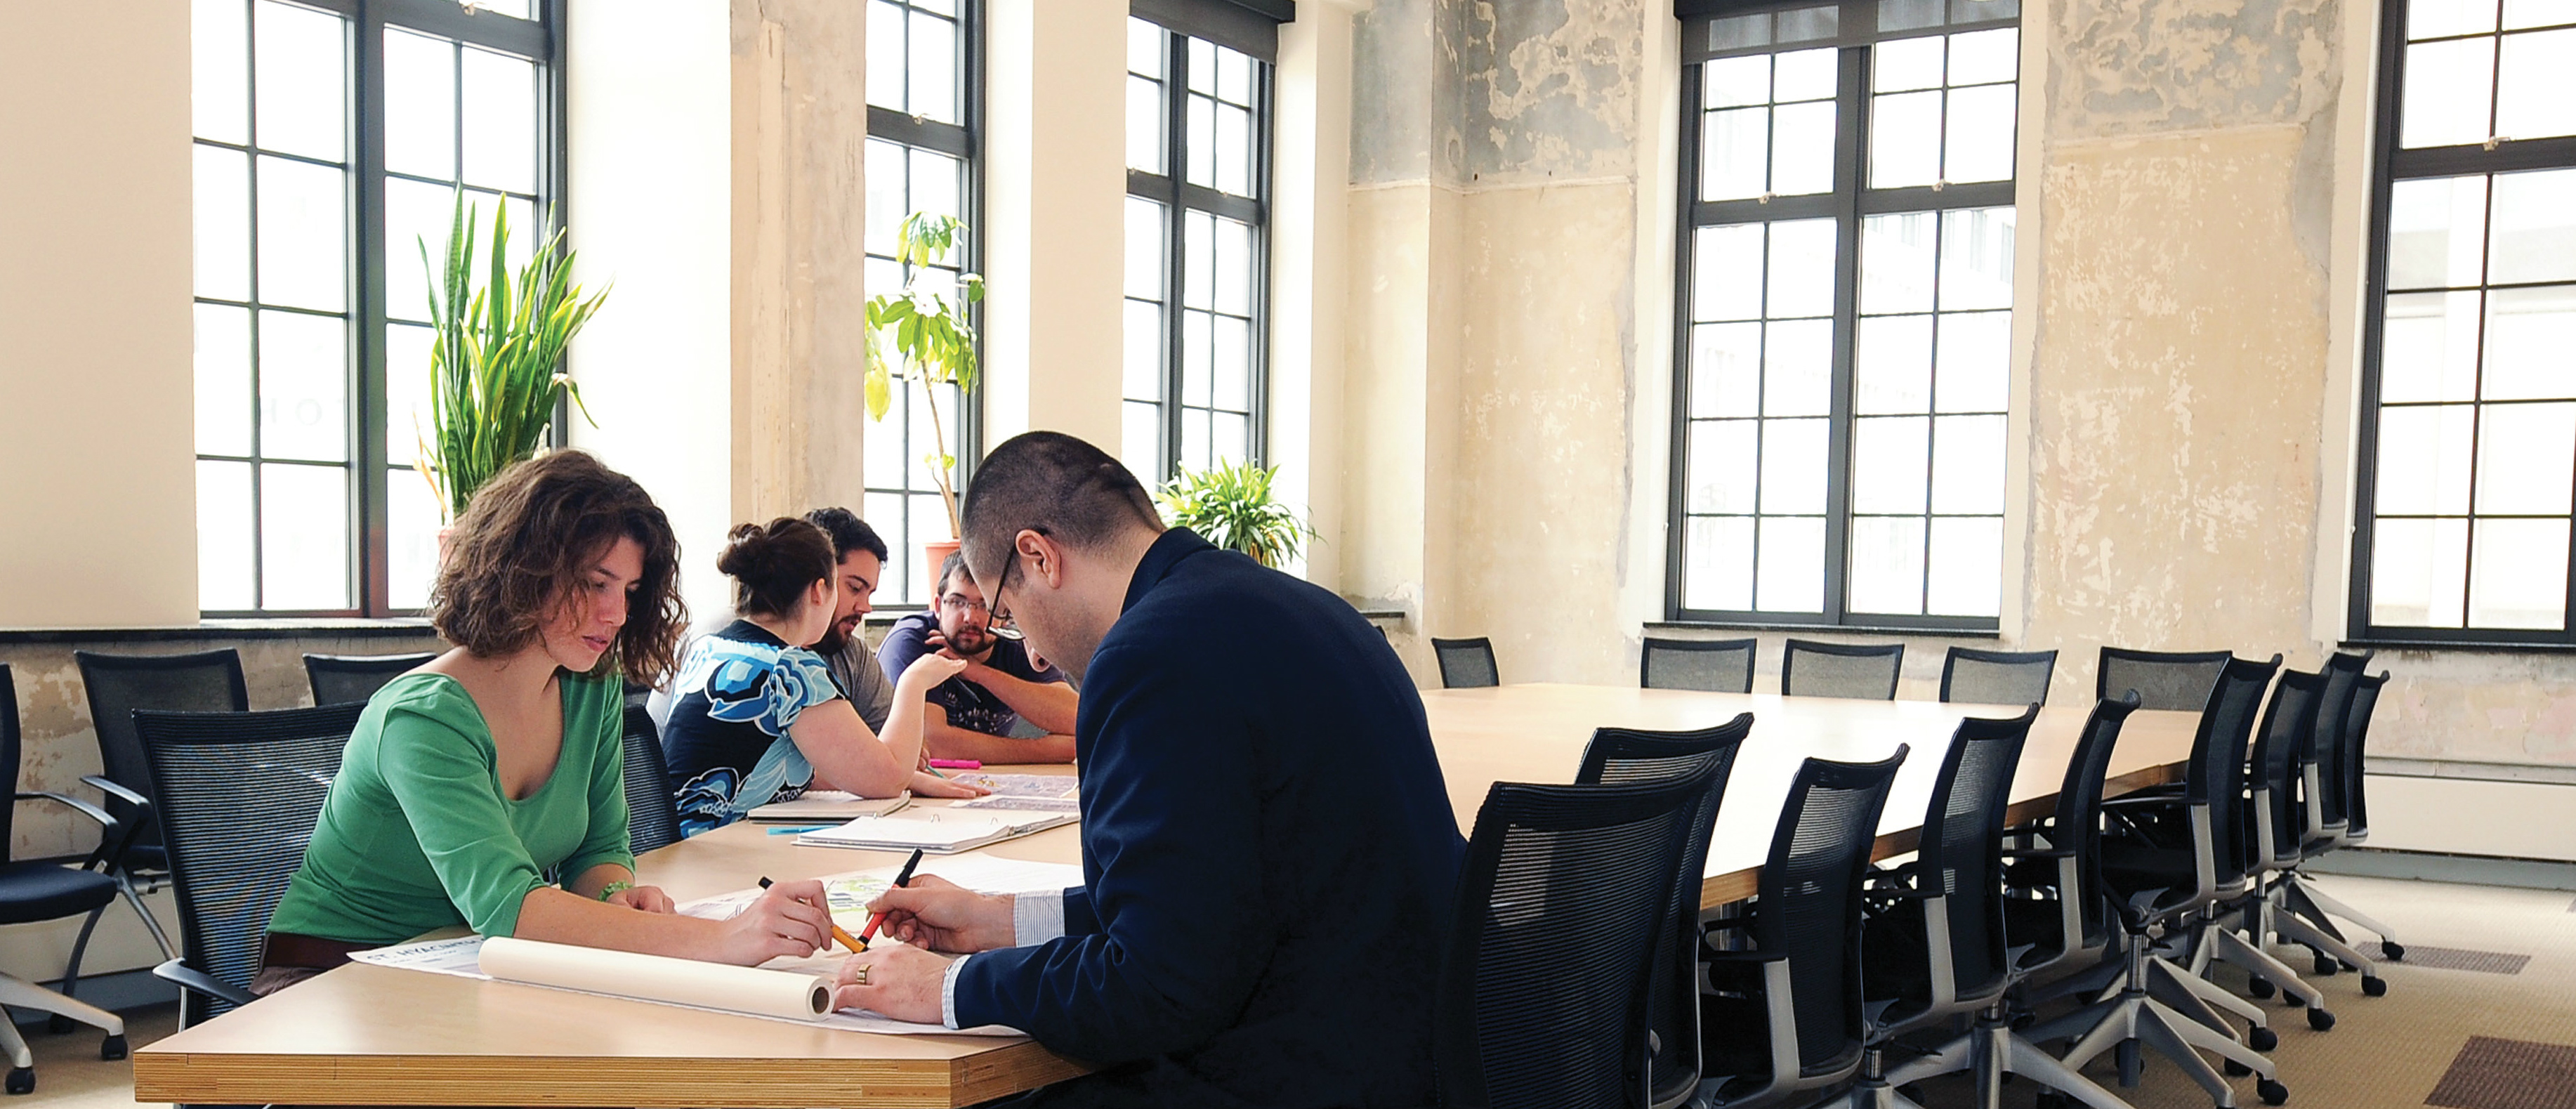 Architecture students collaborate